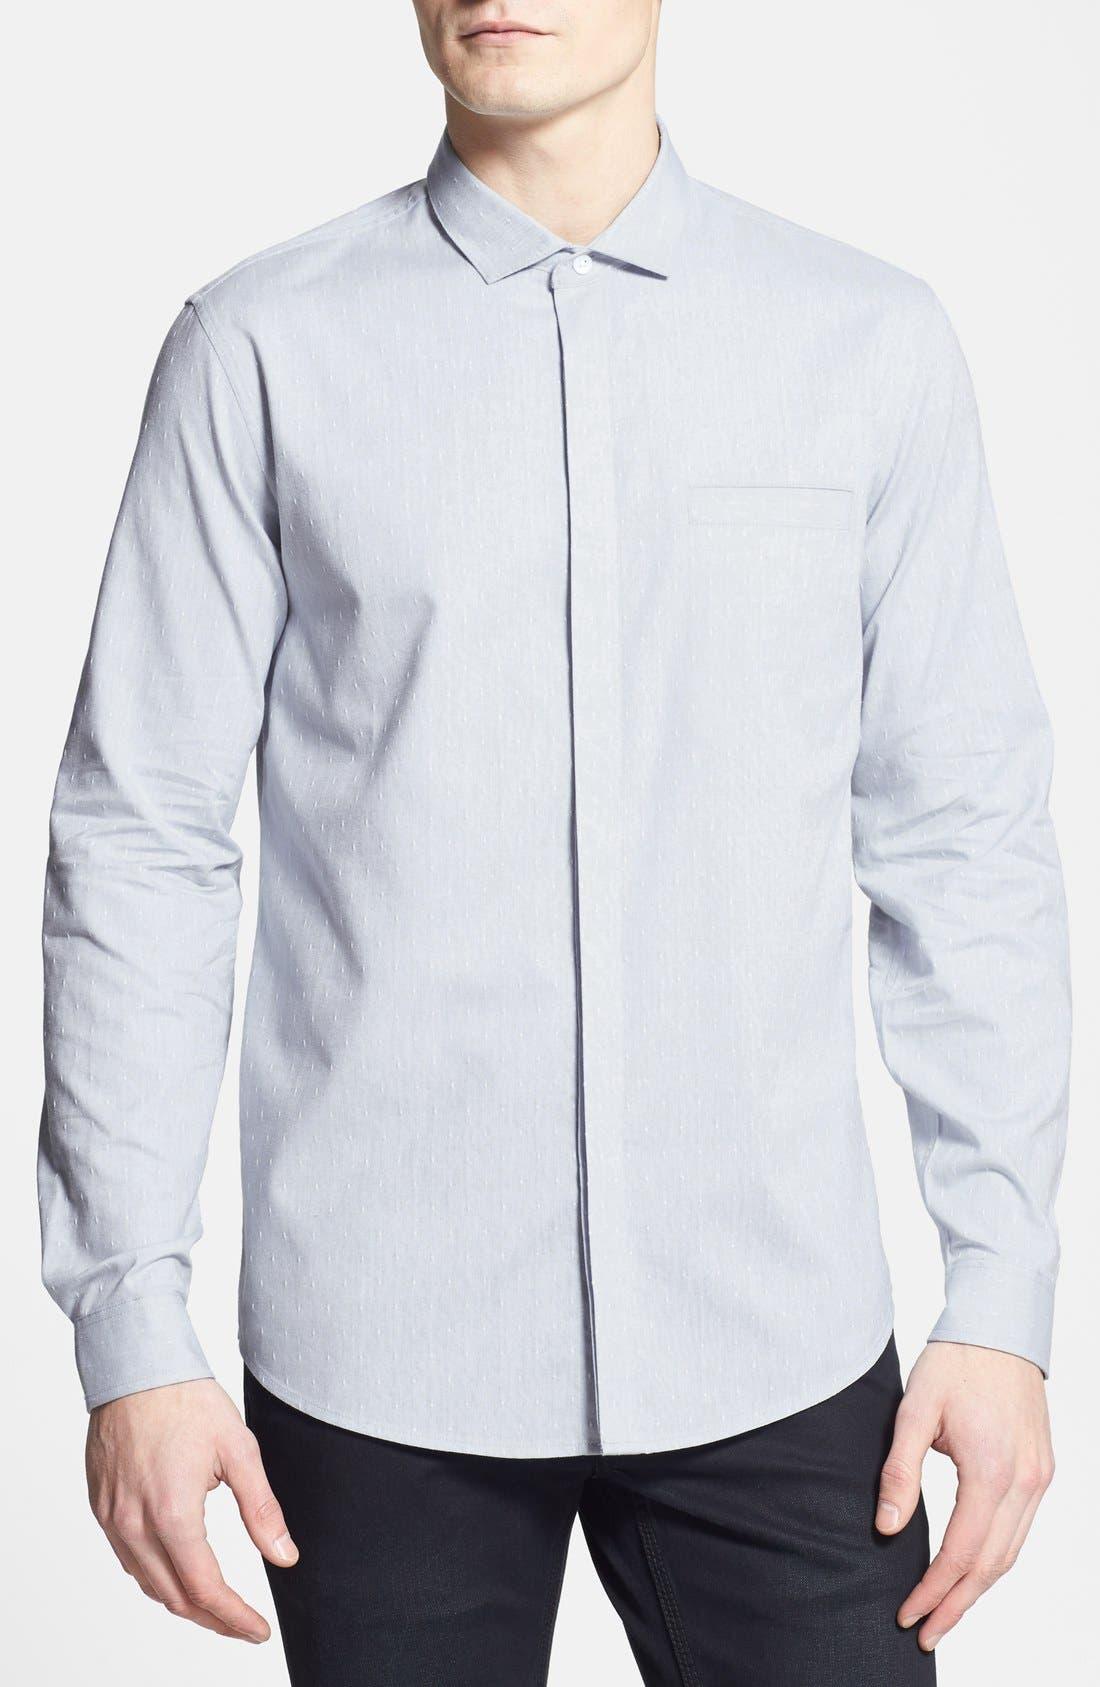 Main Image - Topman Slim Fit Dobby Shirt